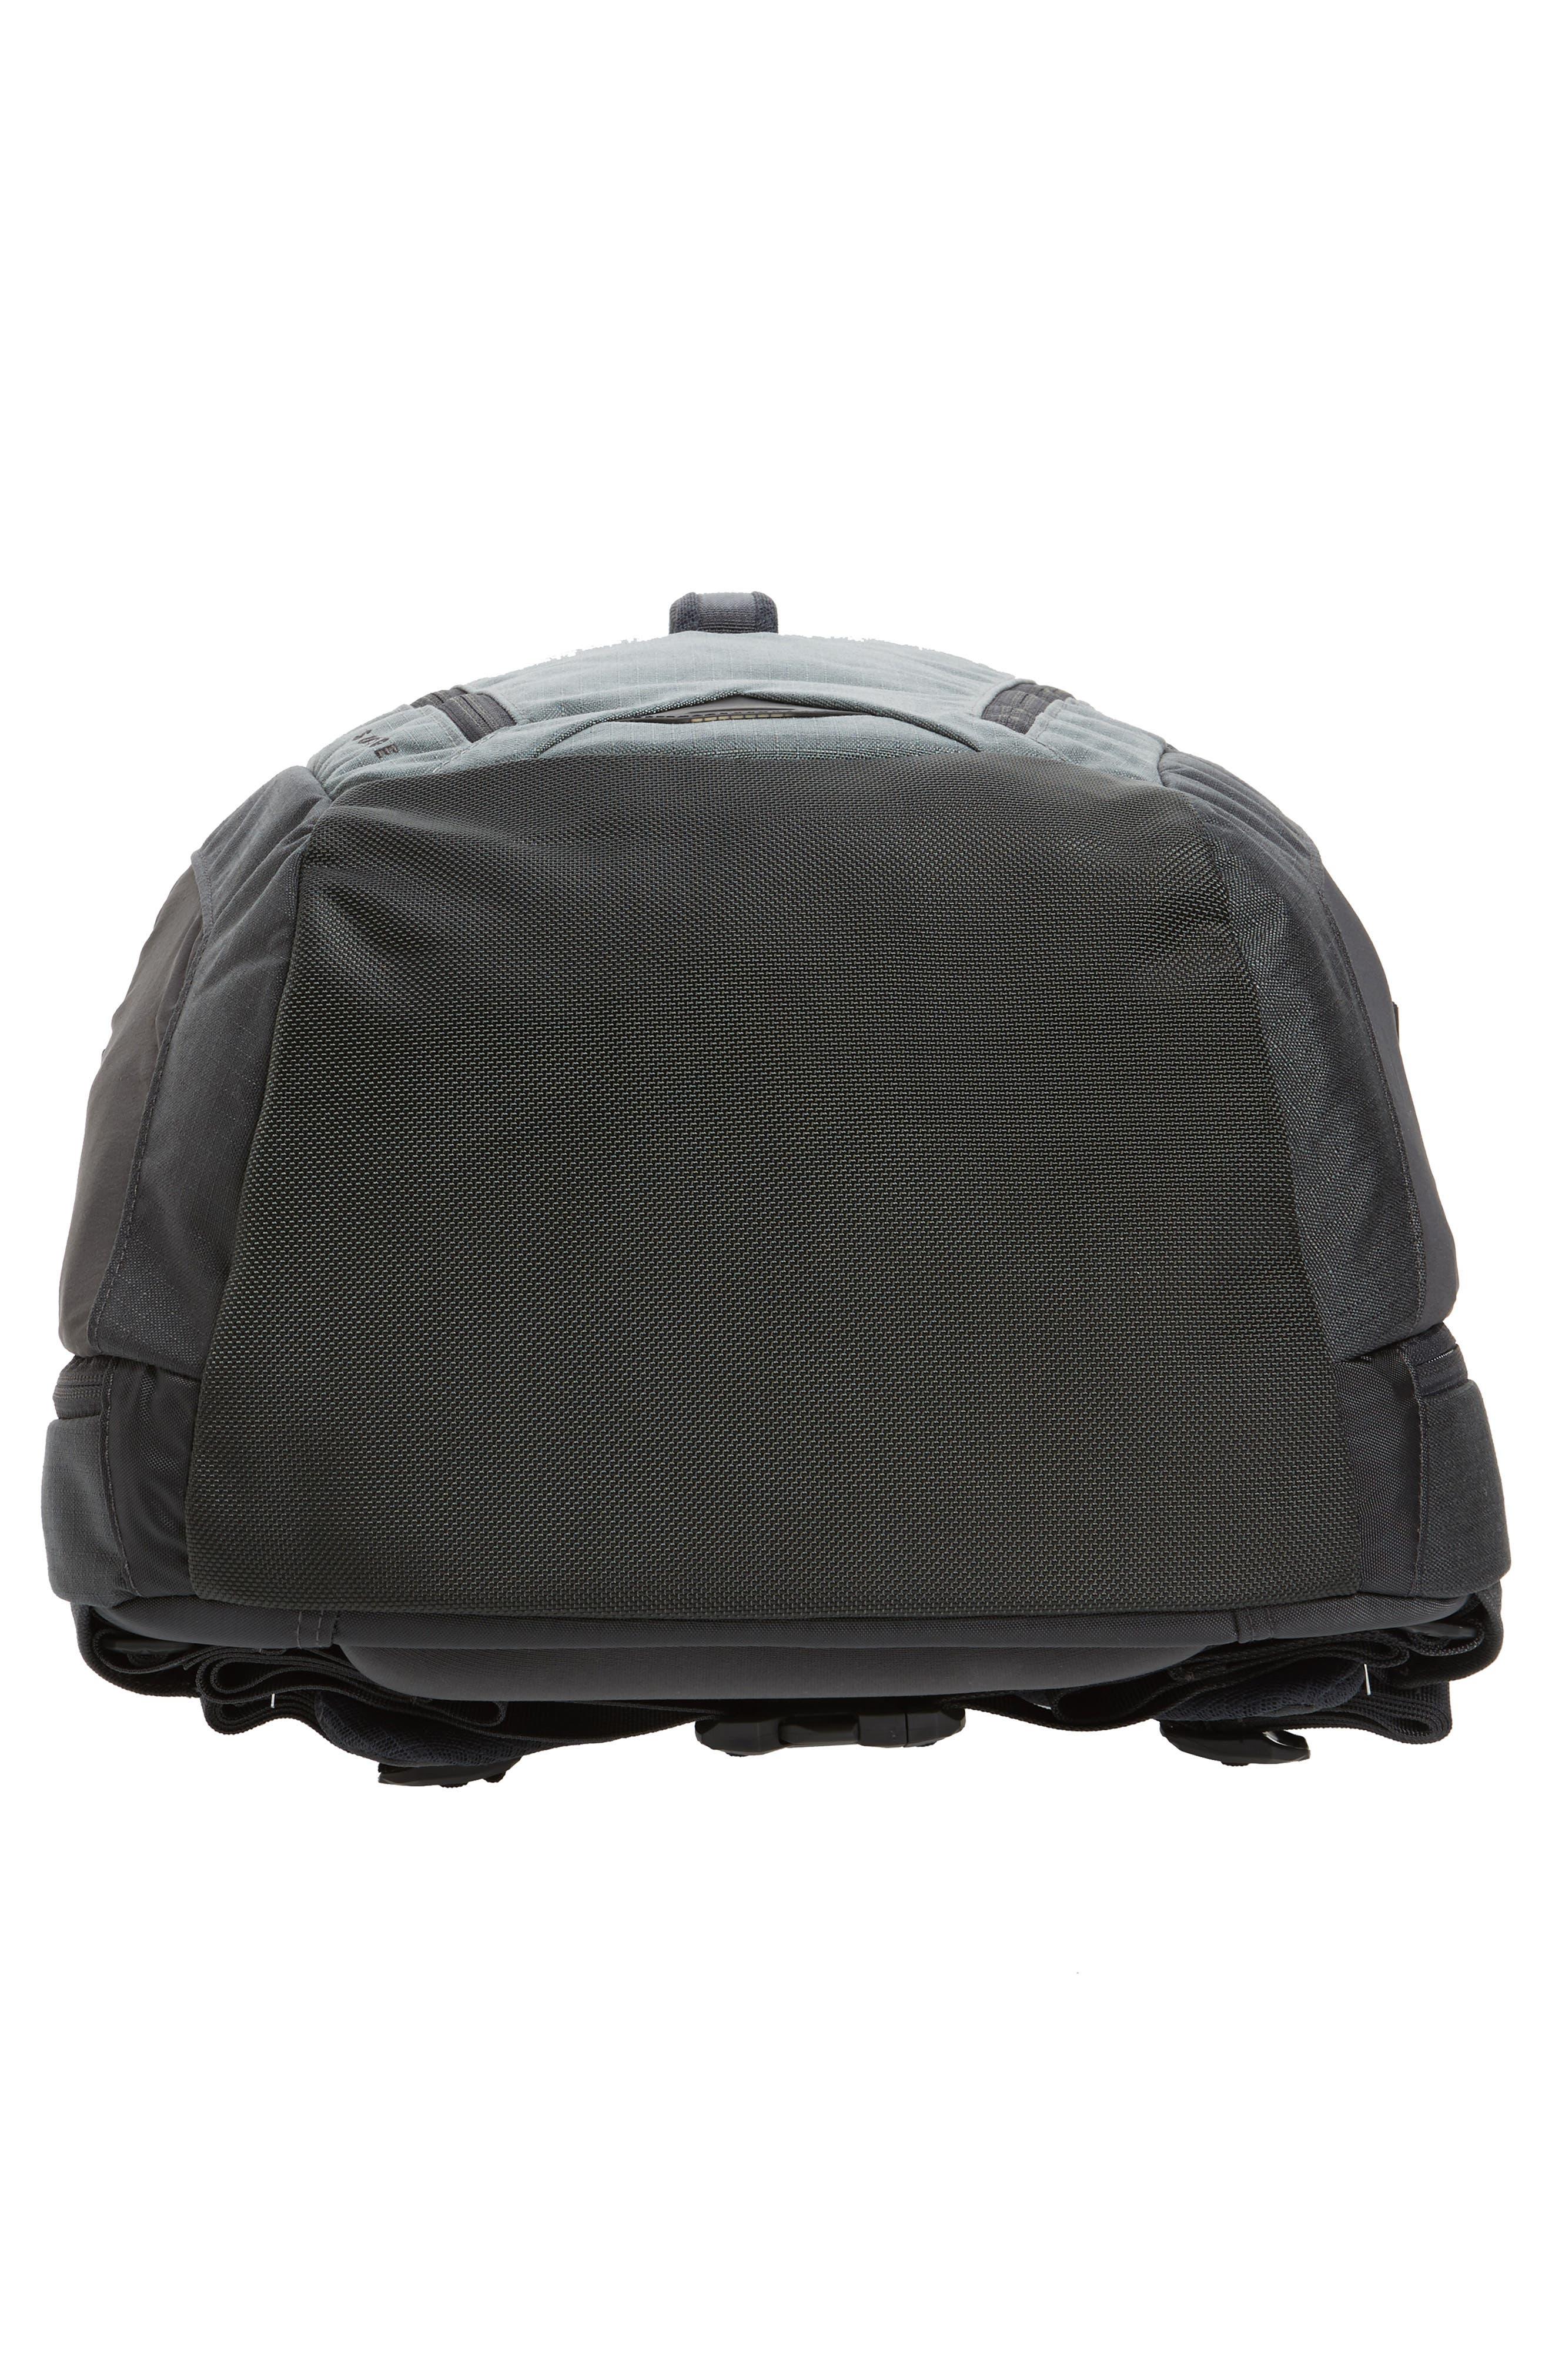 Surge 33L Backpack,                             Alternate thumbnail 20, color,